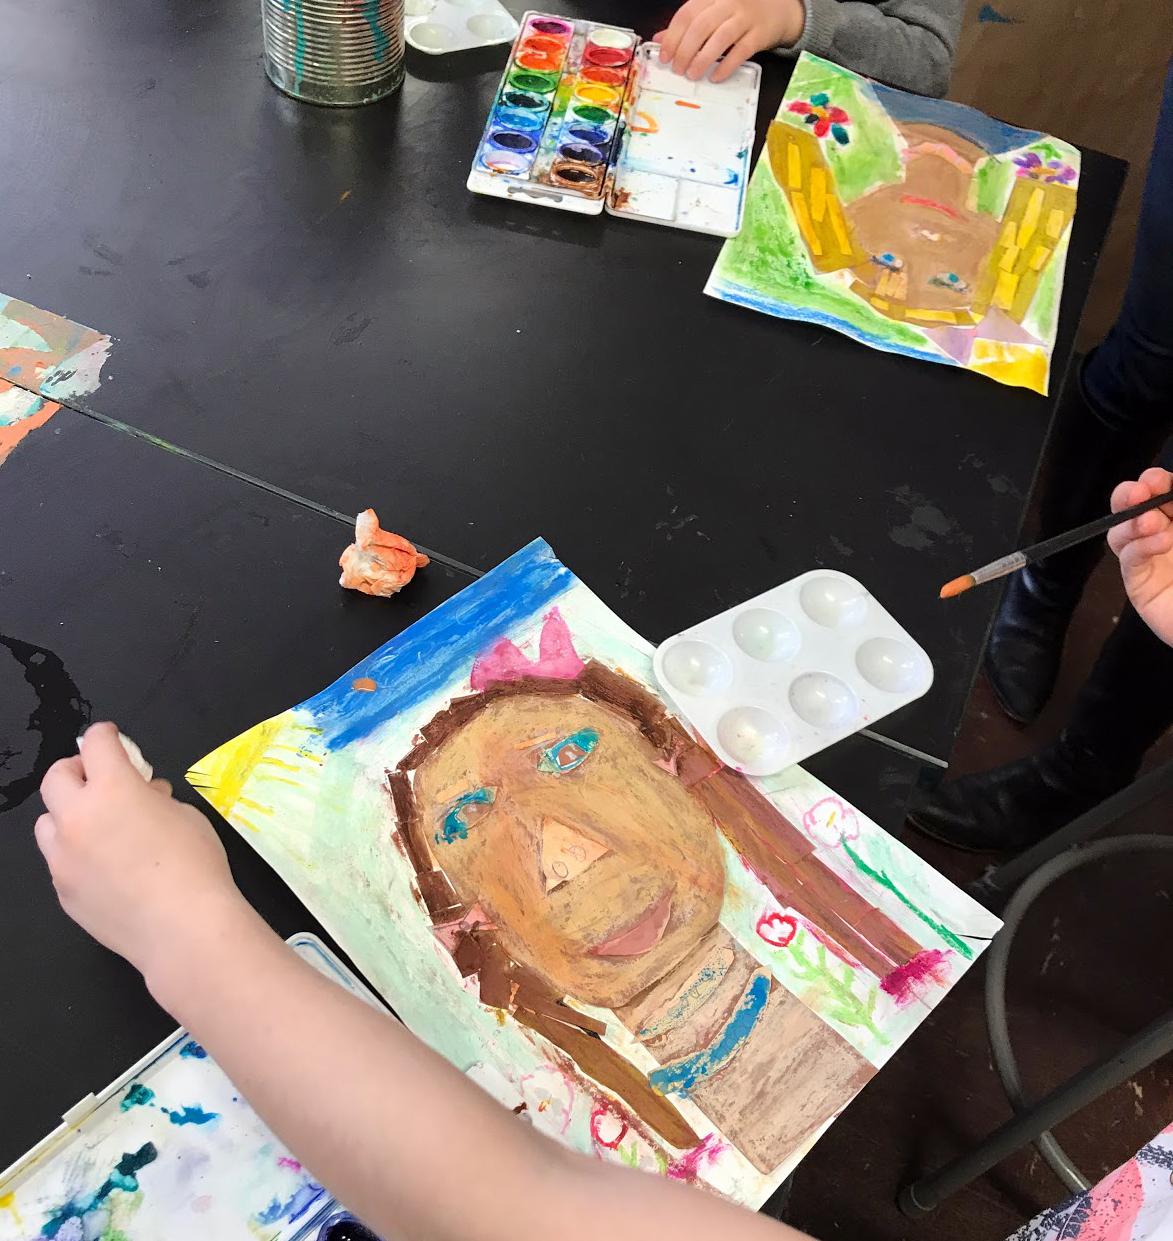 Self portraits, second grade